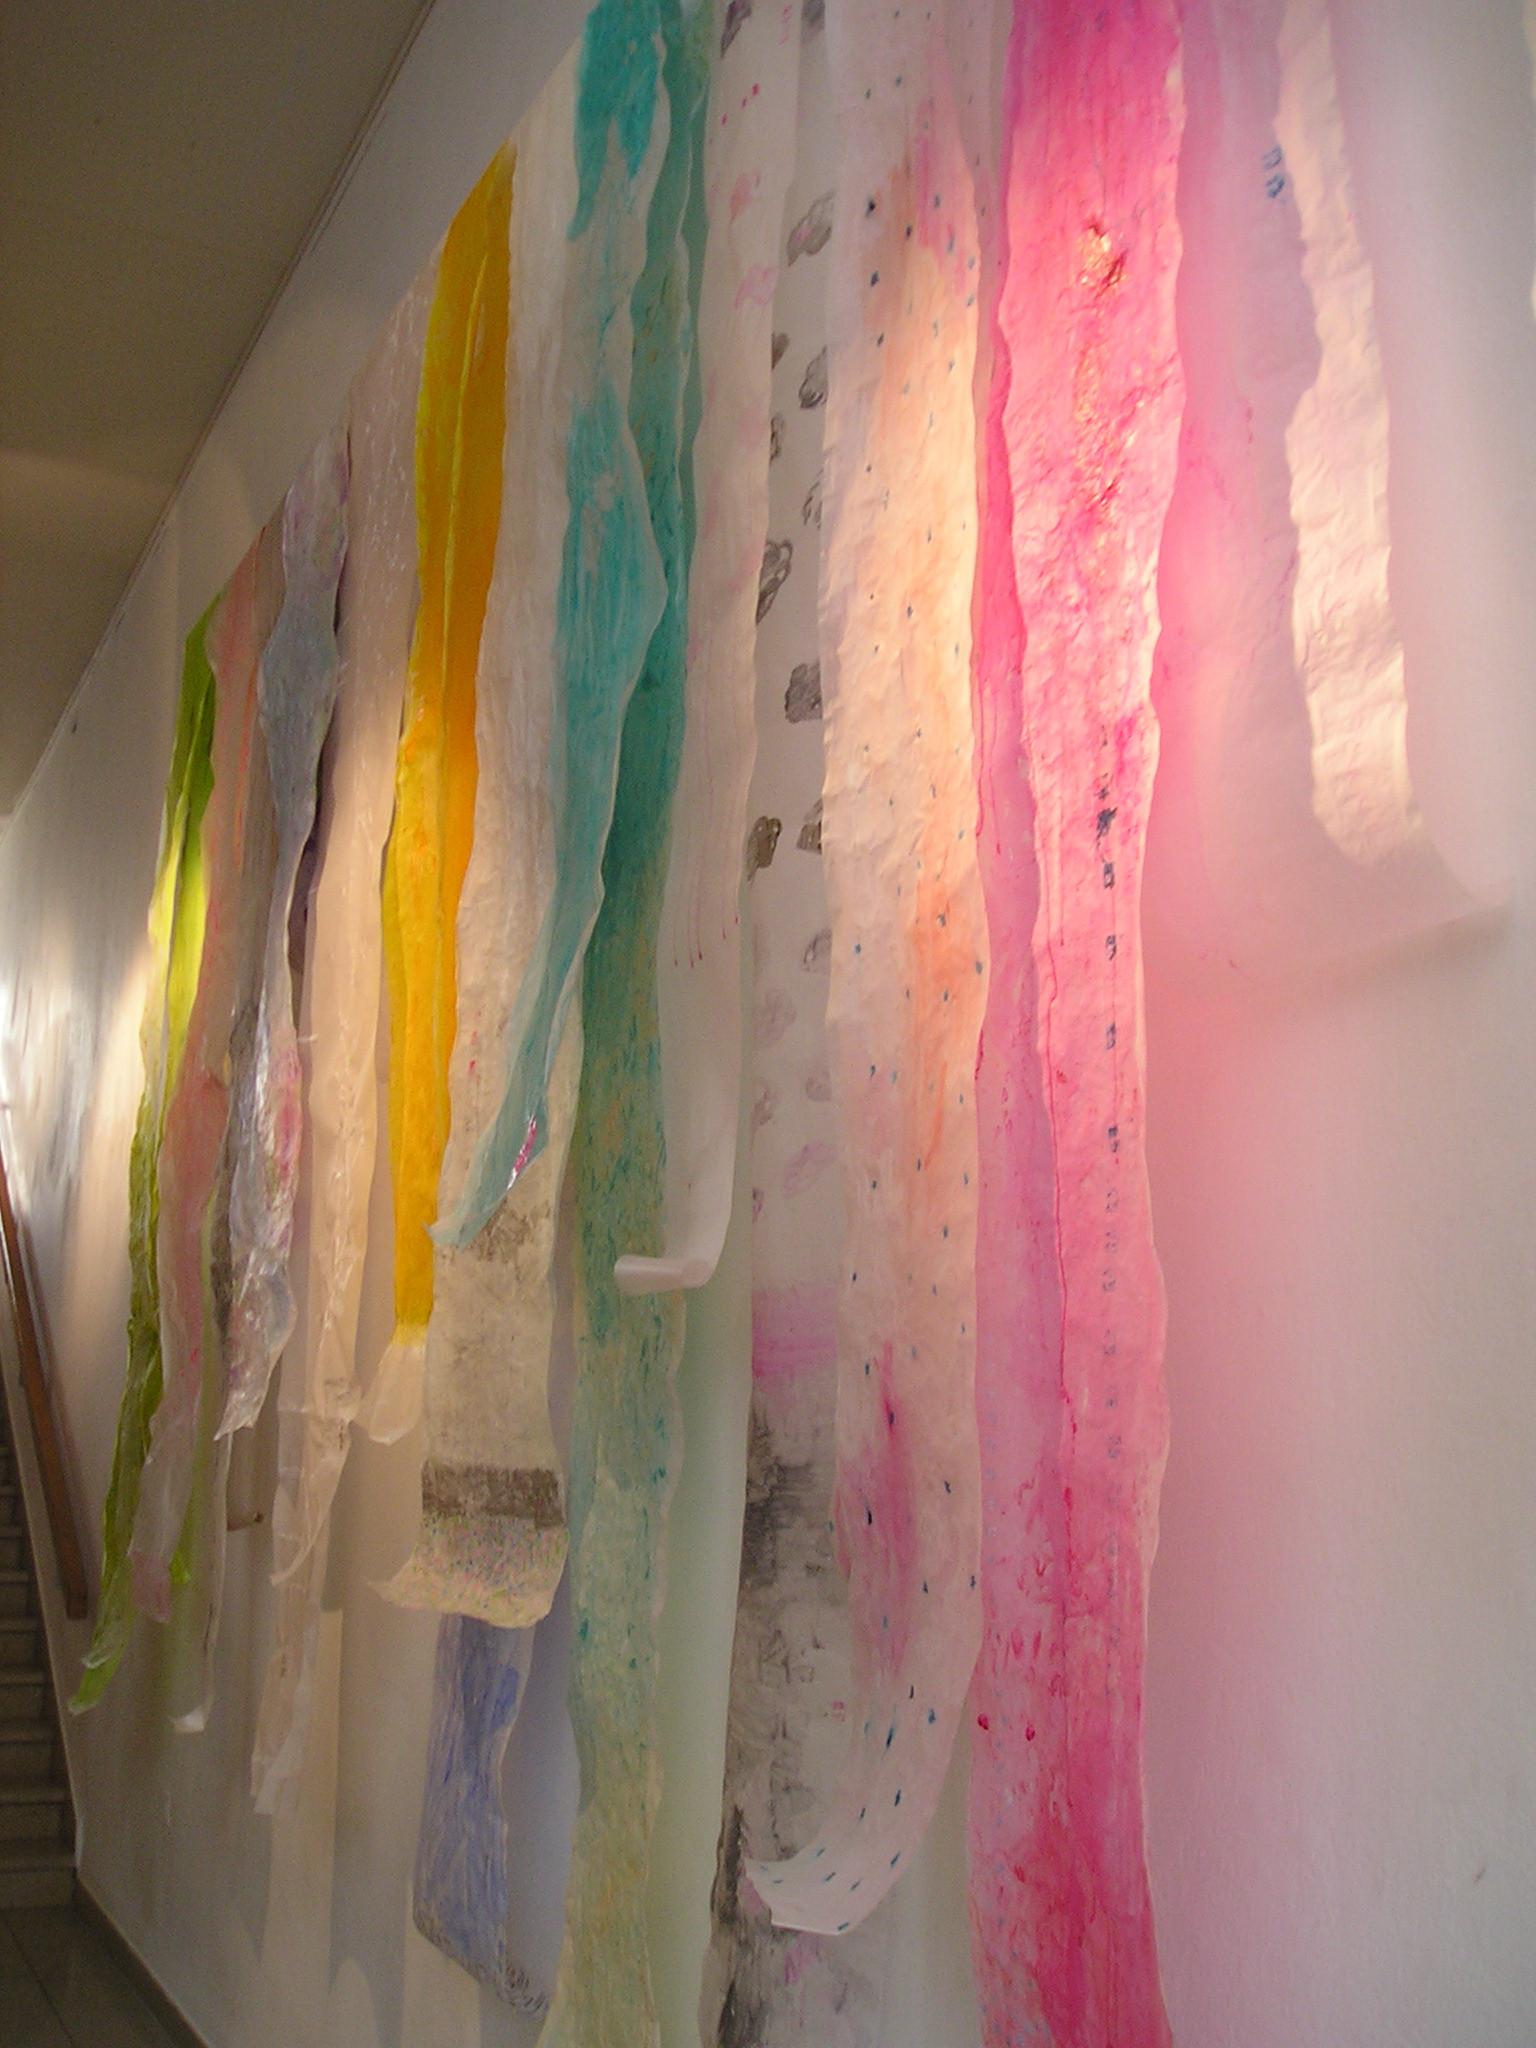 Japana - Drying Silks, installation